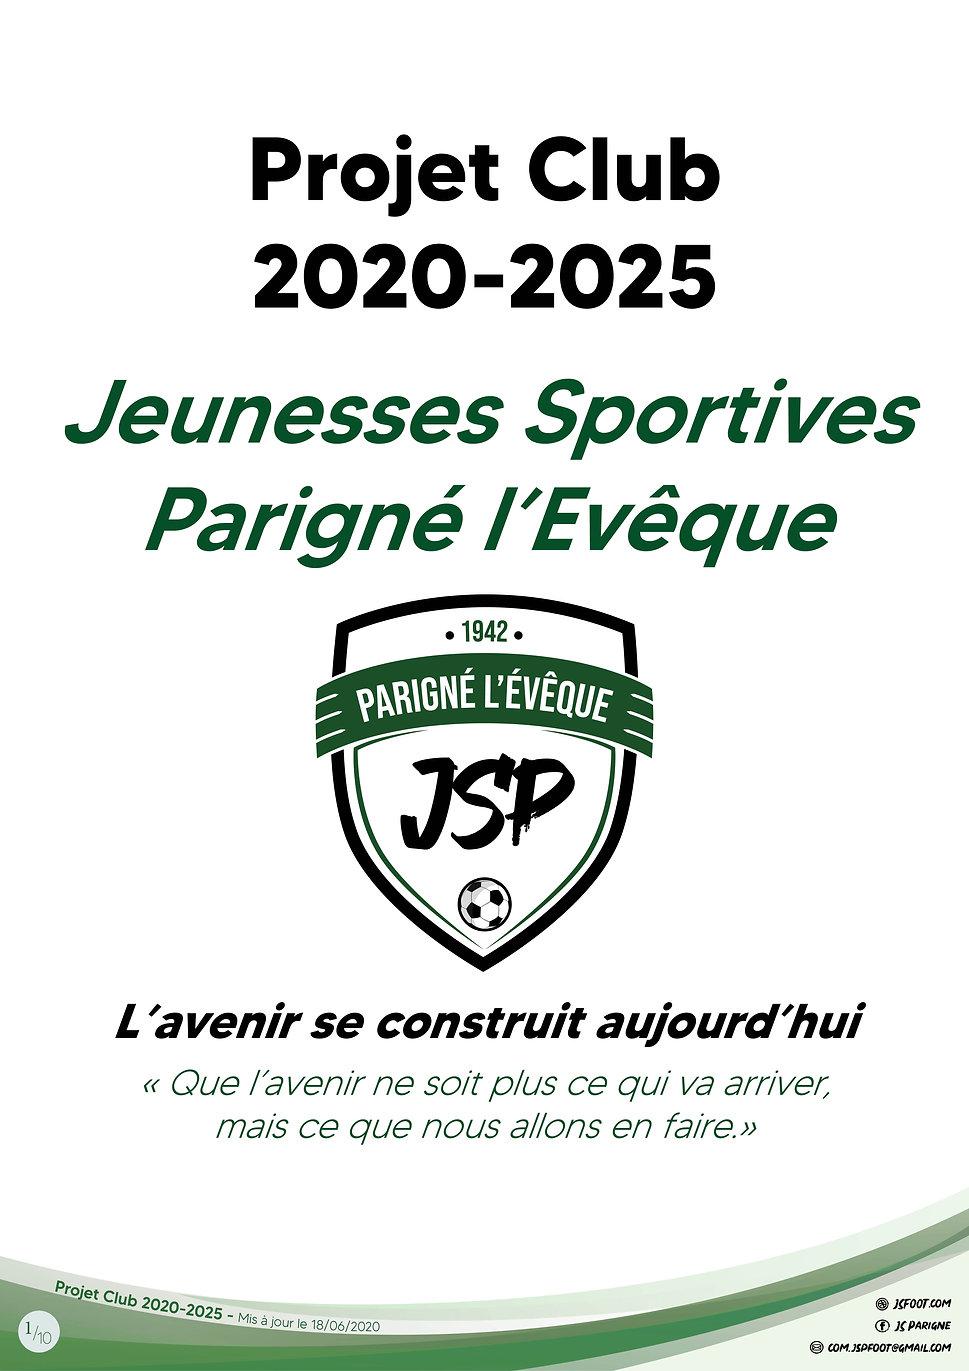 Projet Club 2020-2025.jpg